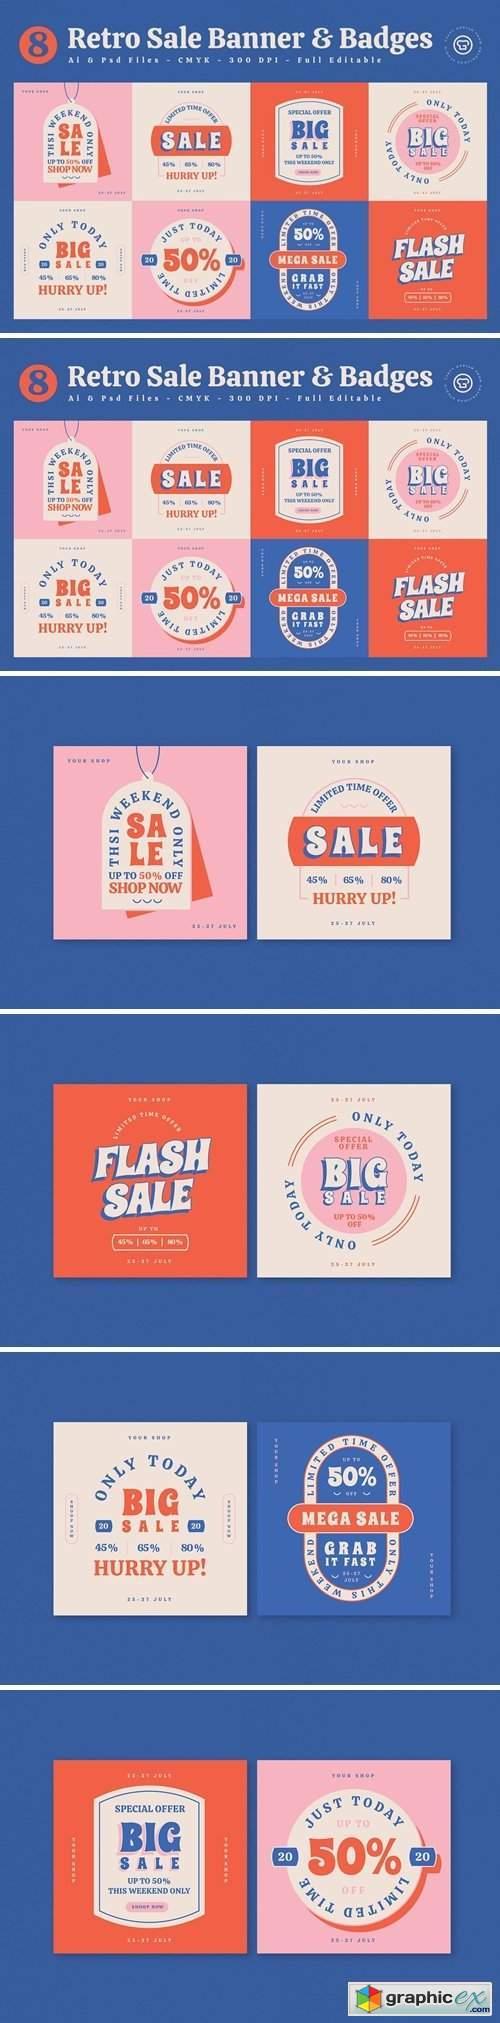 Retro Sale Banner & Badges